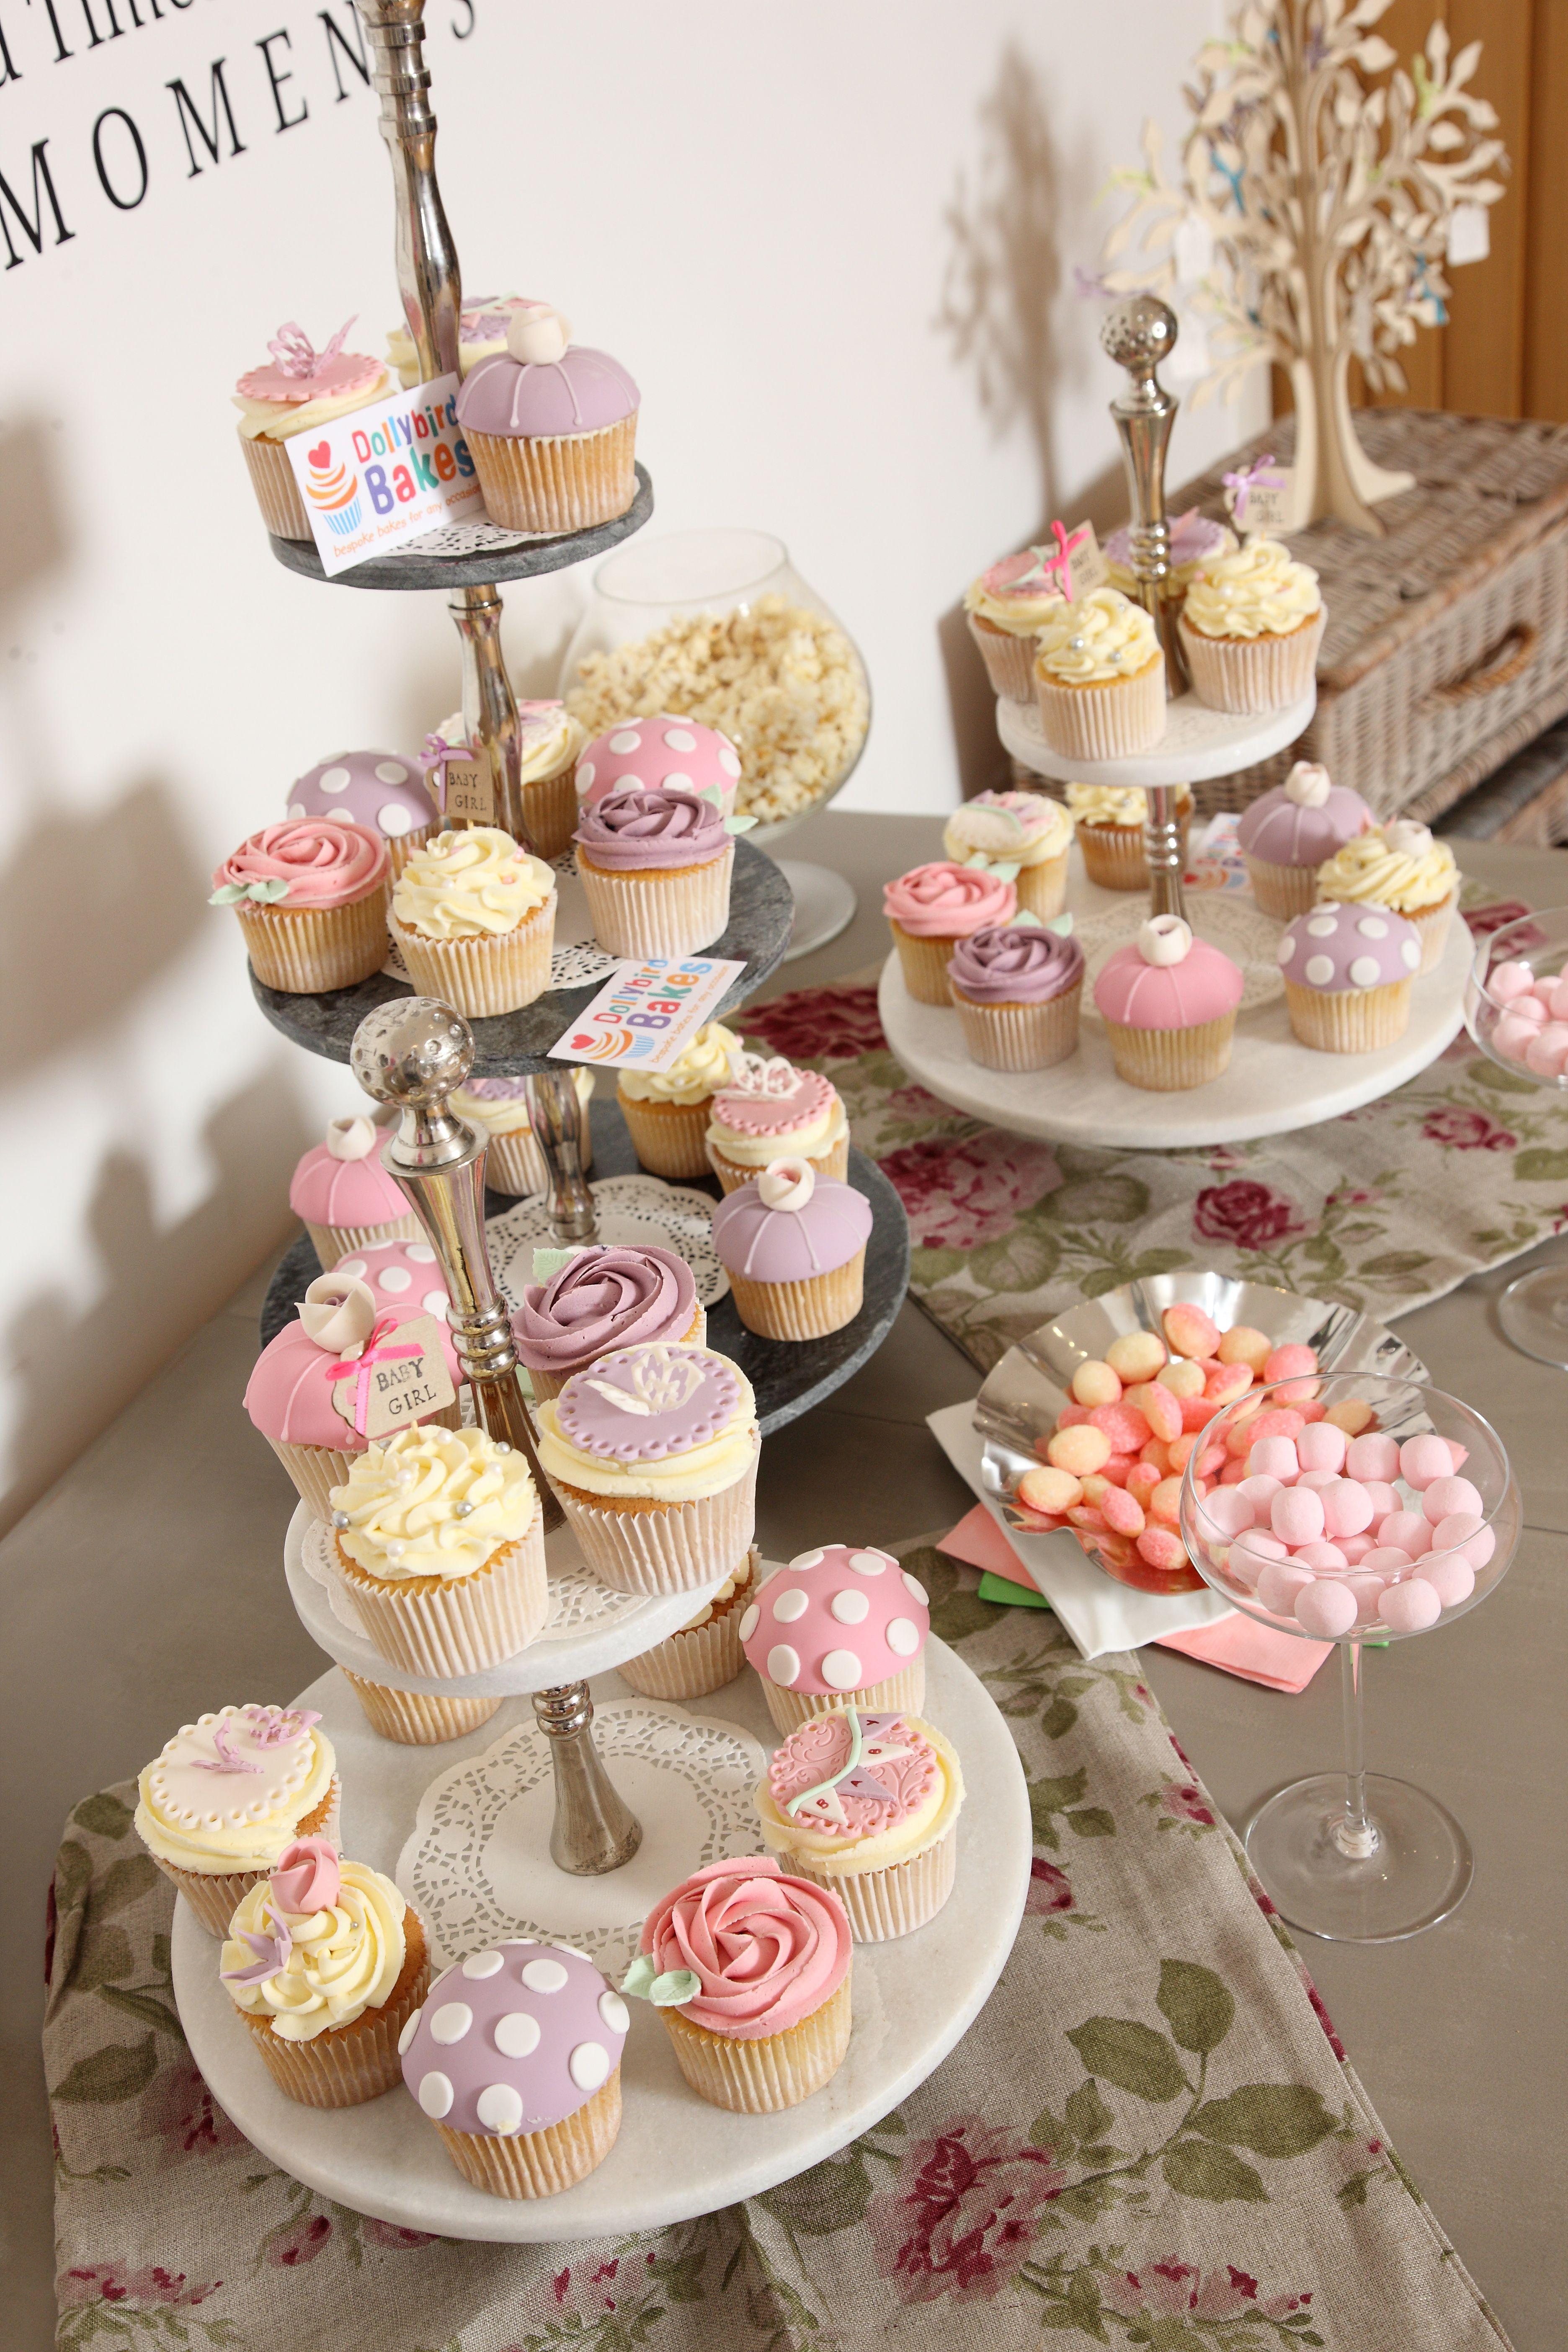 Pretty & Delicious!  Cupcakes by Dollybird Bakes of Launceston!